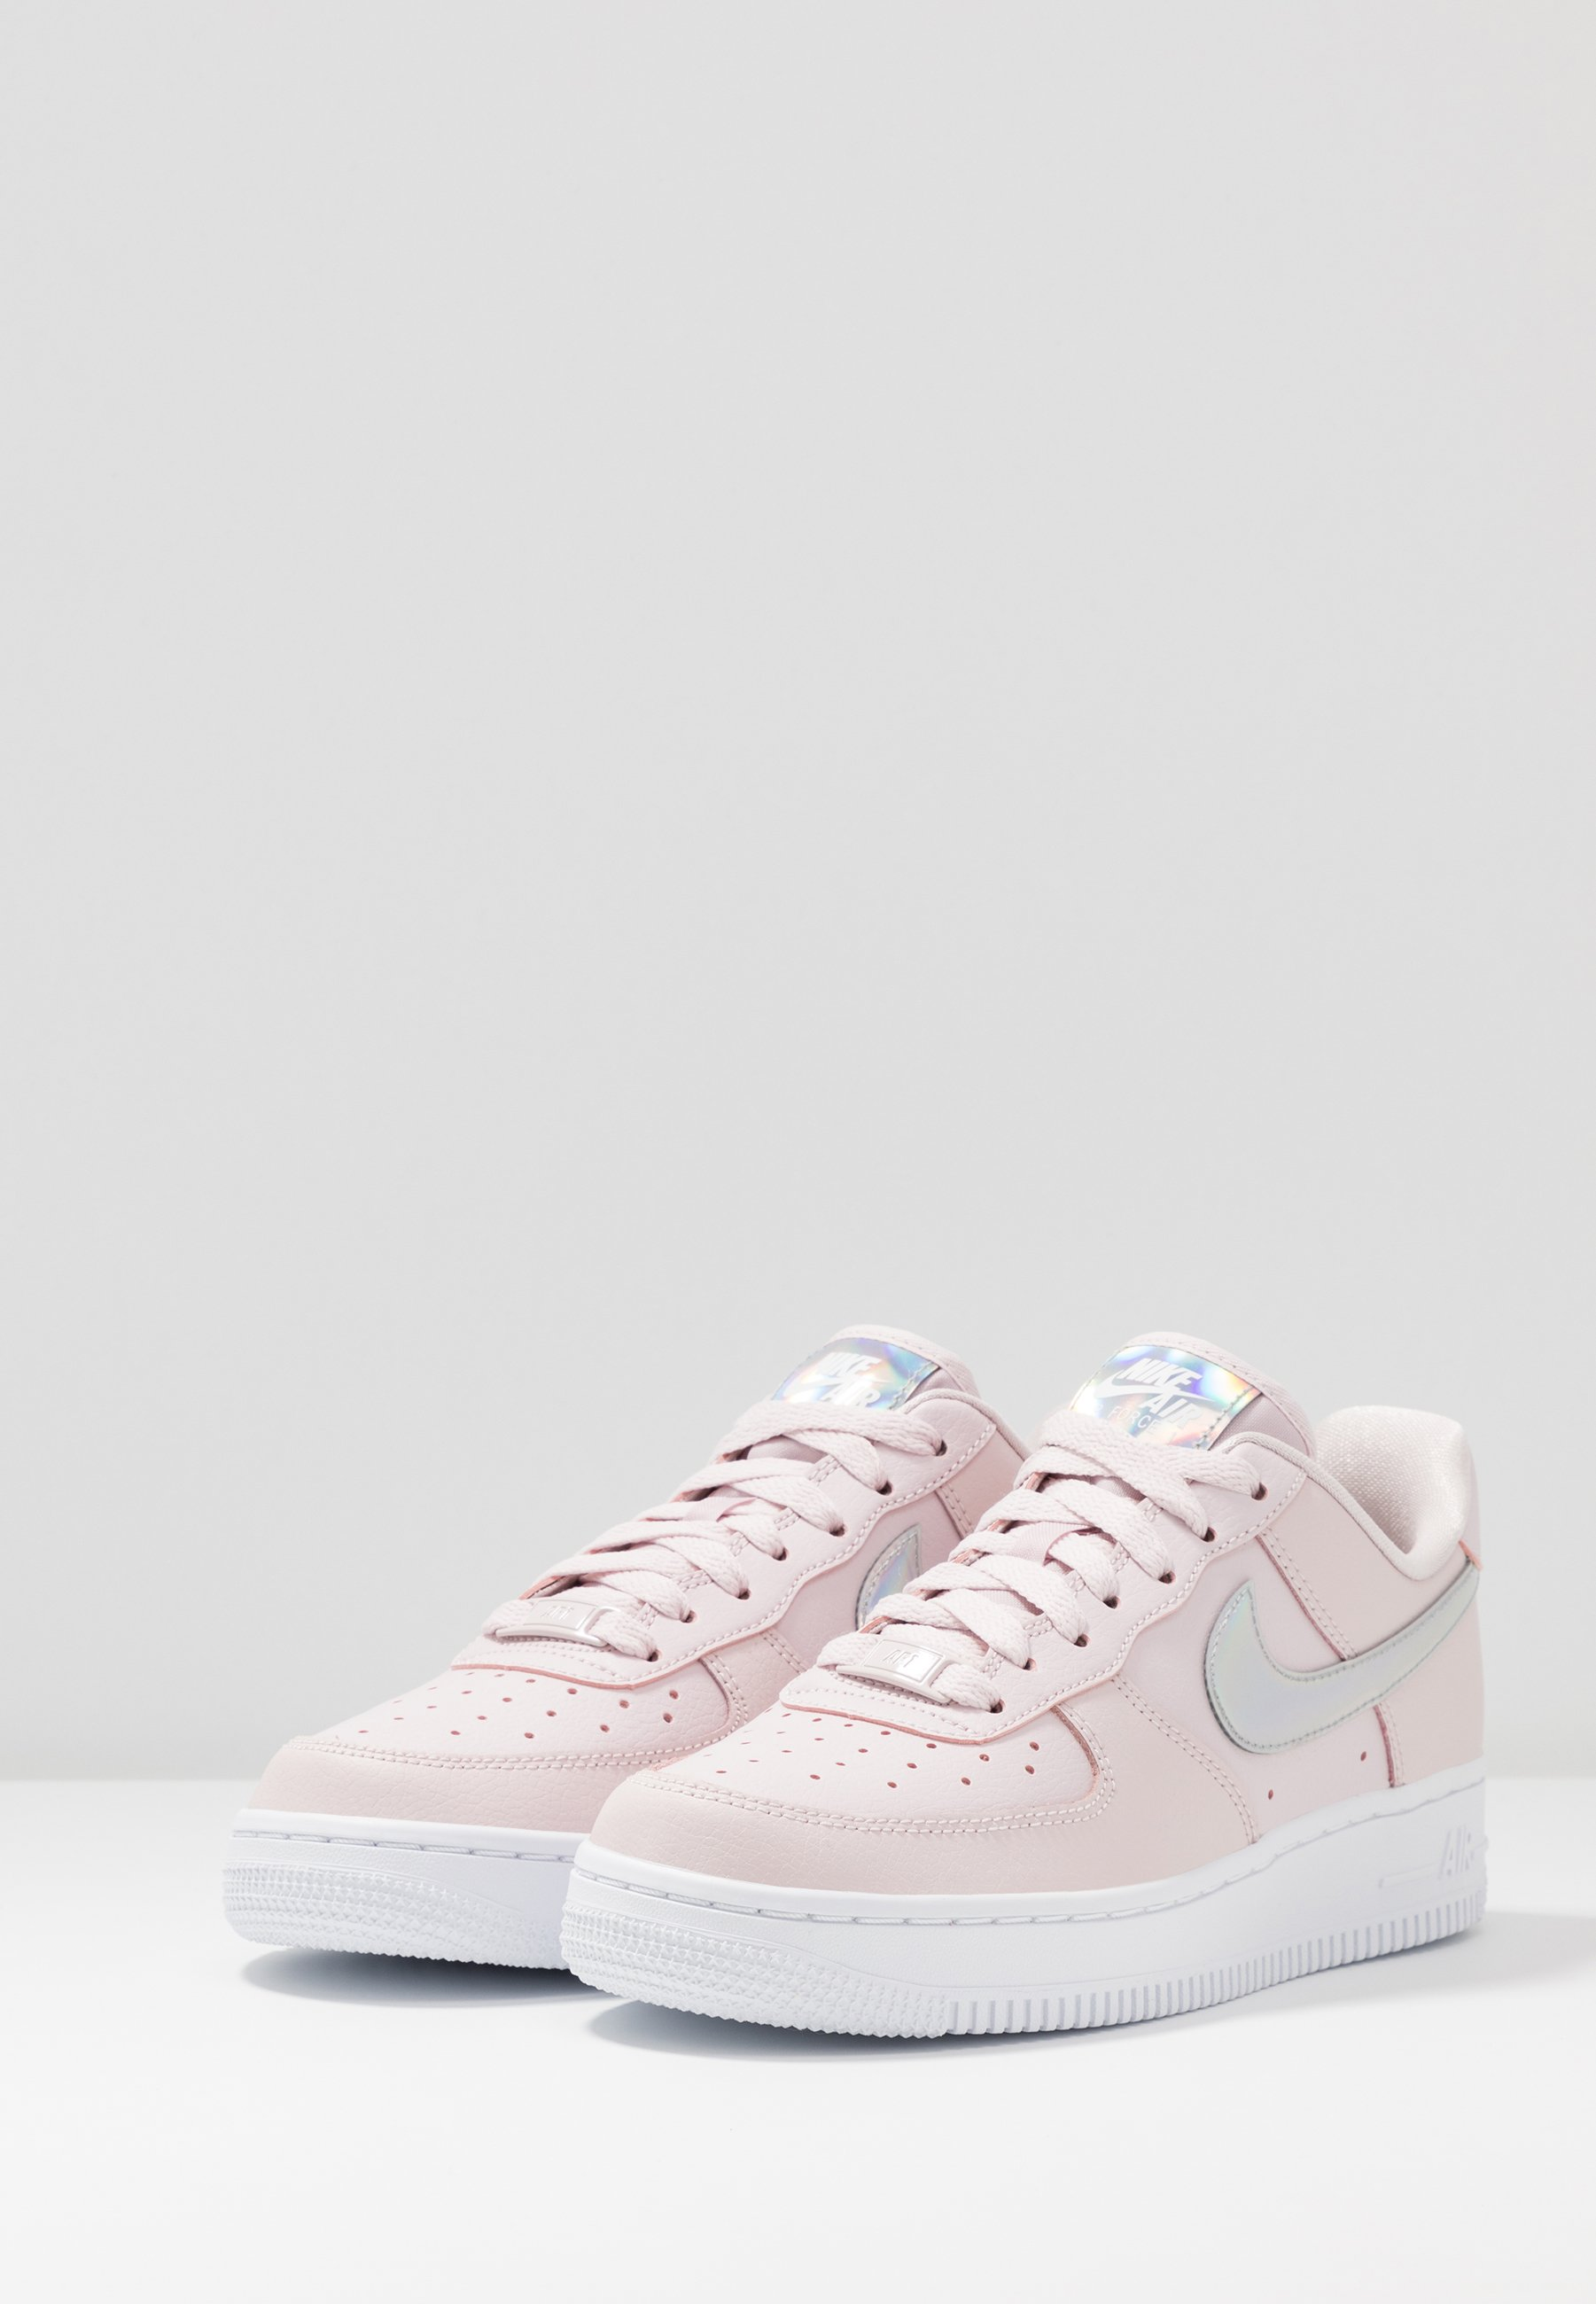 basket nike air force 1 fille rose